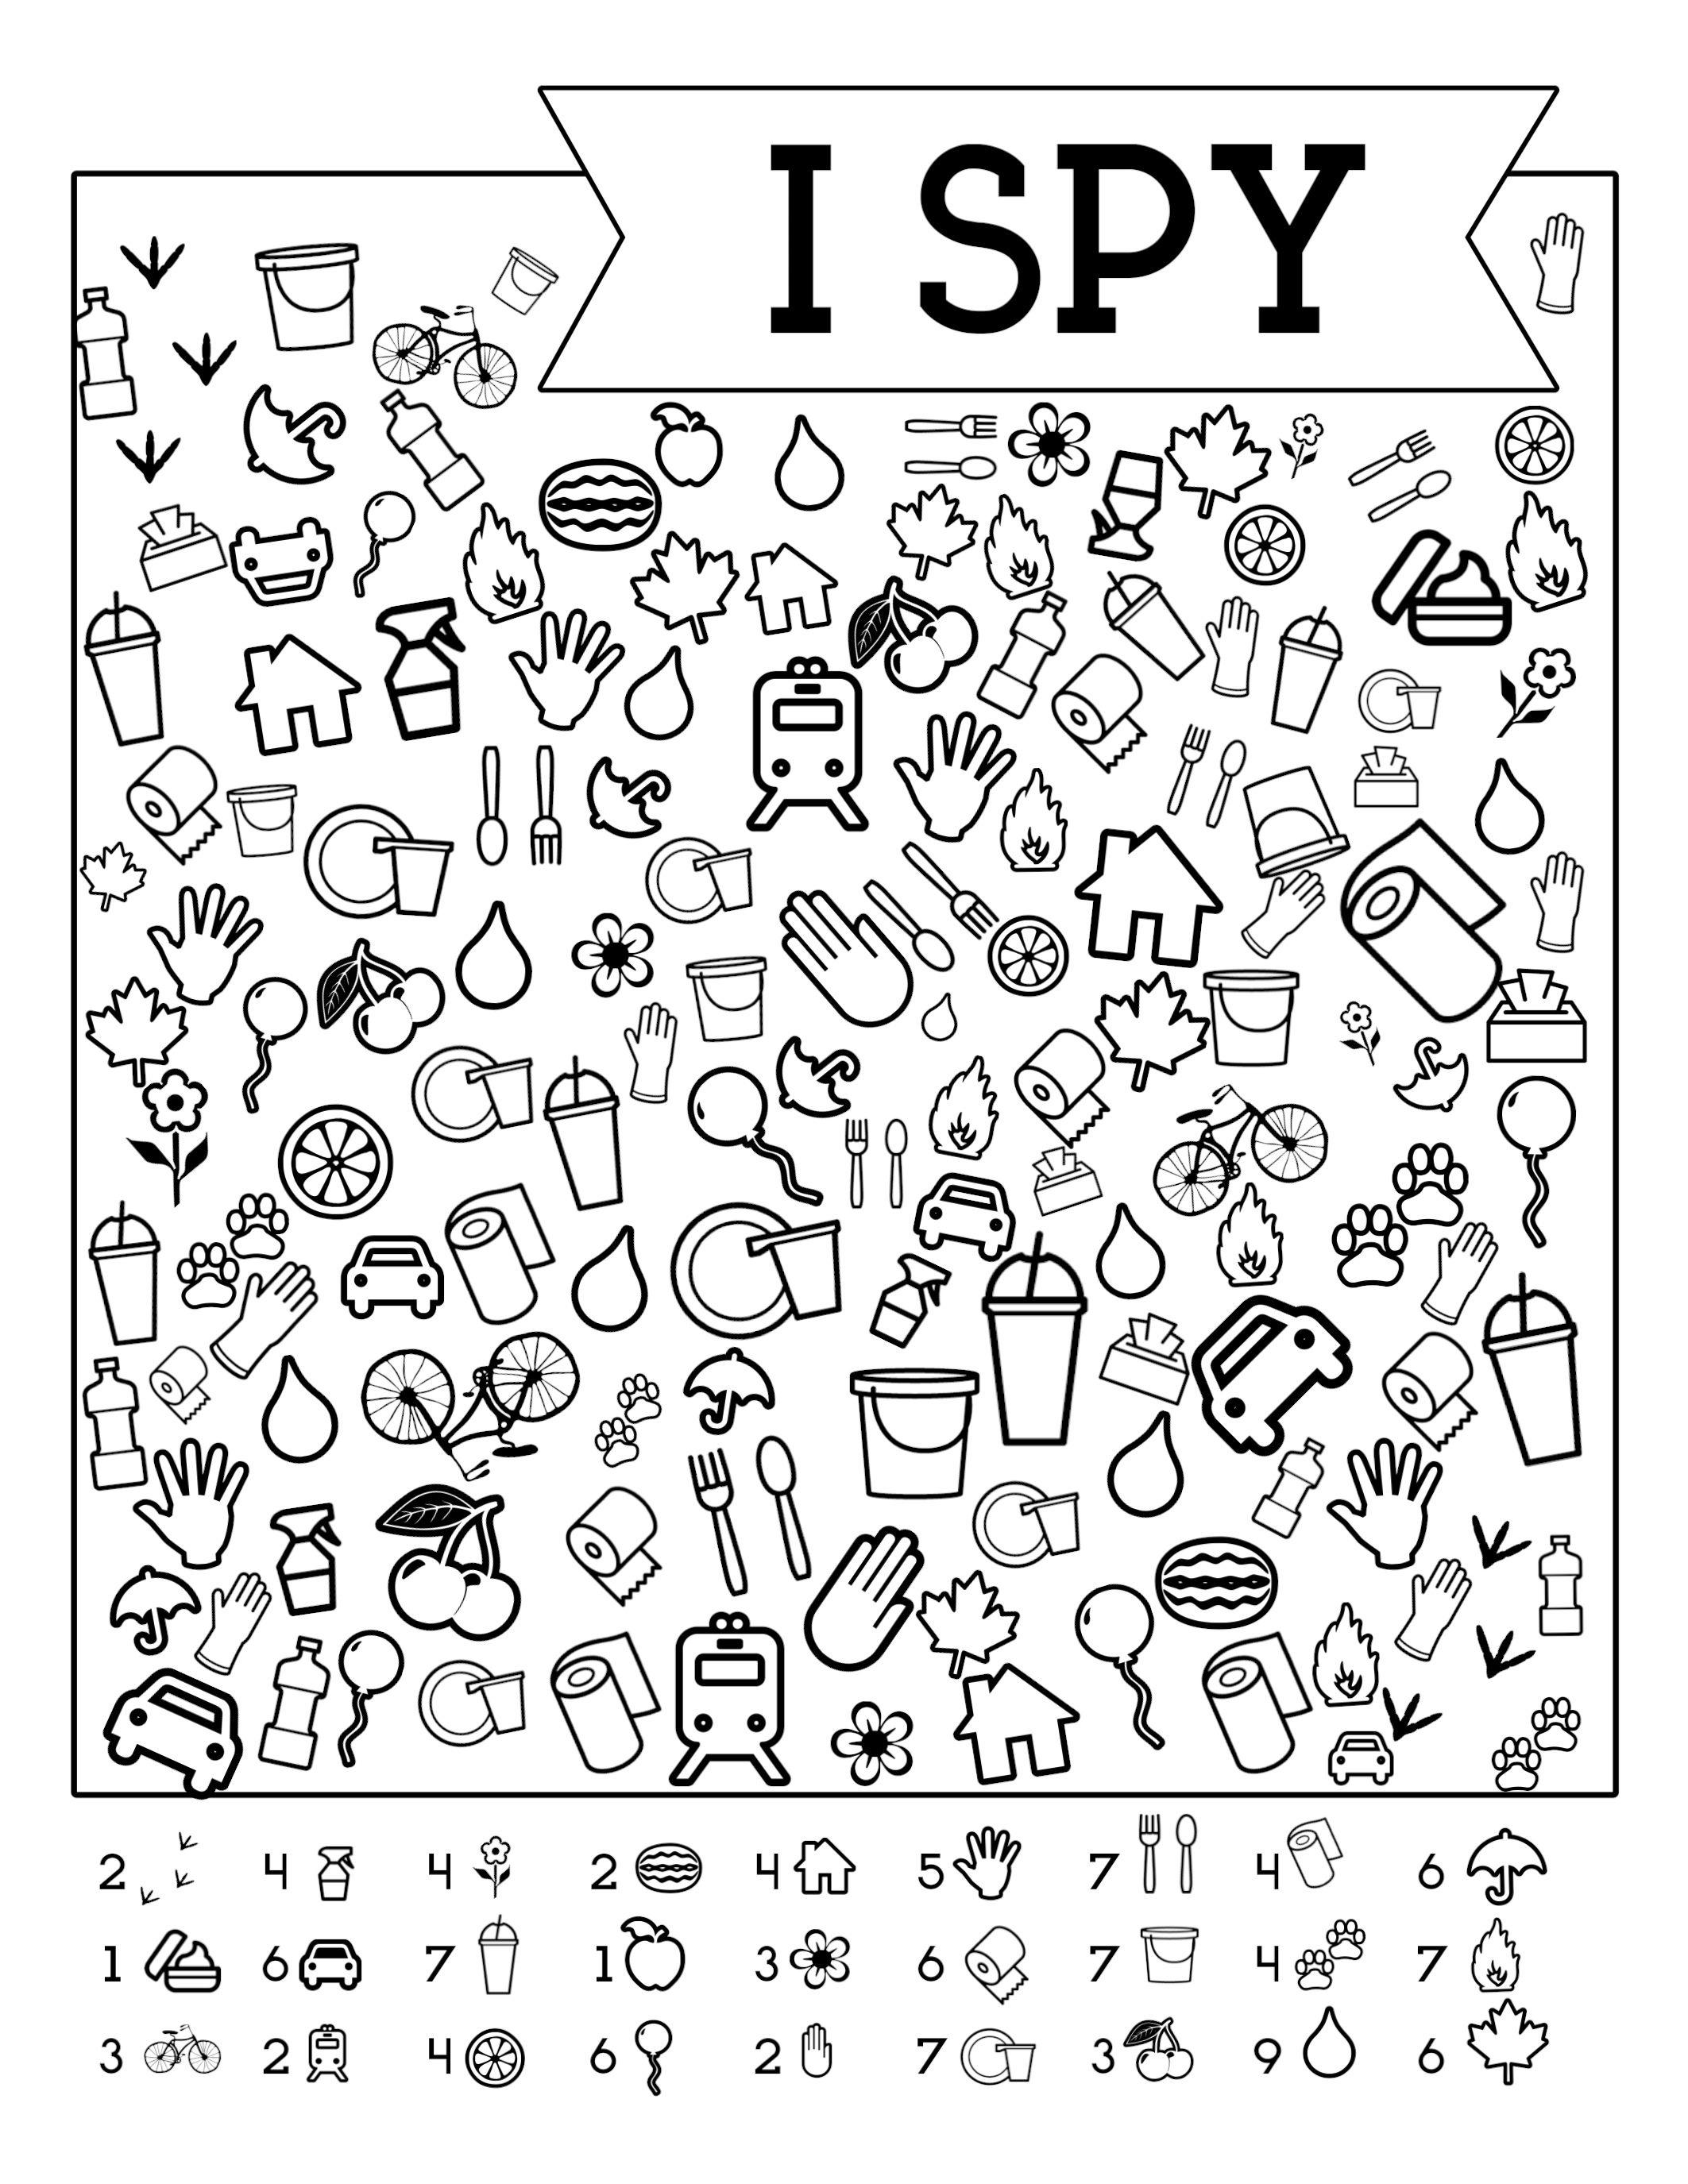 I-Spy-Free-Printable-Kids-Game   Spy School Camp   Spy Games For - Free Printables For Kids